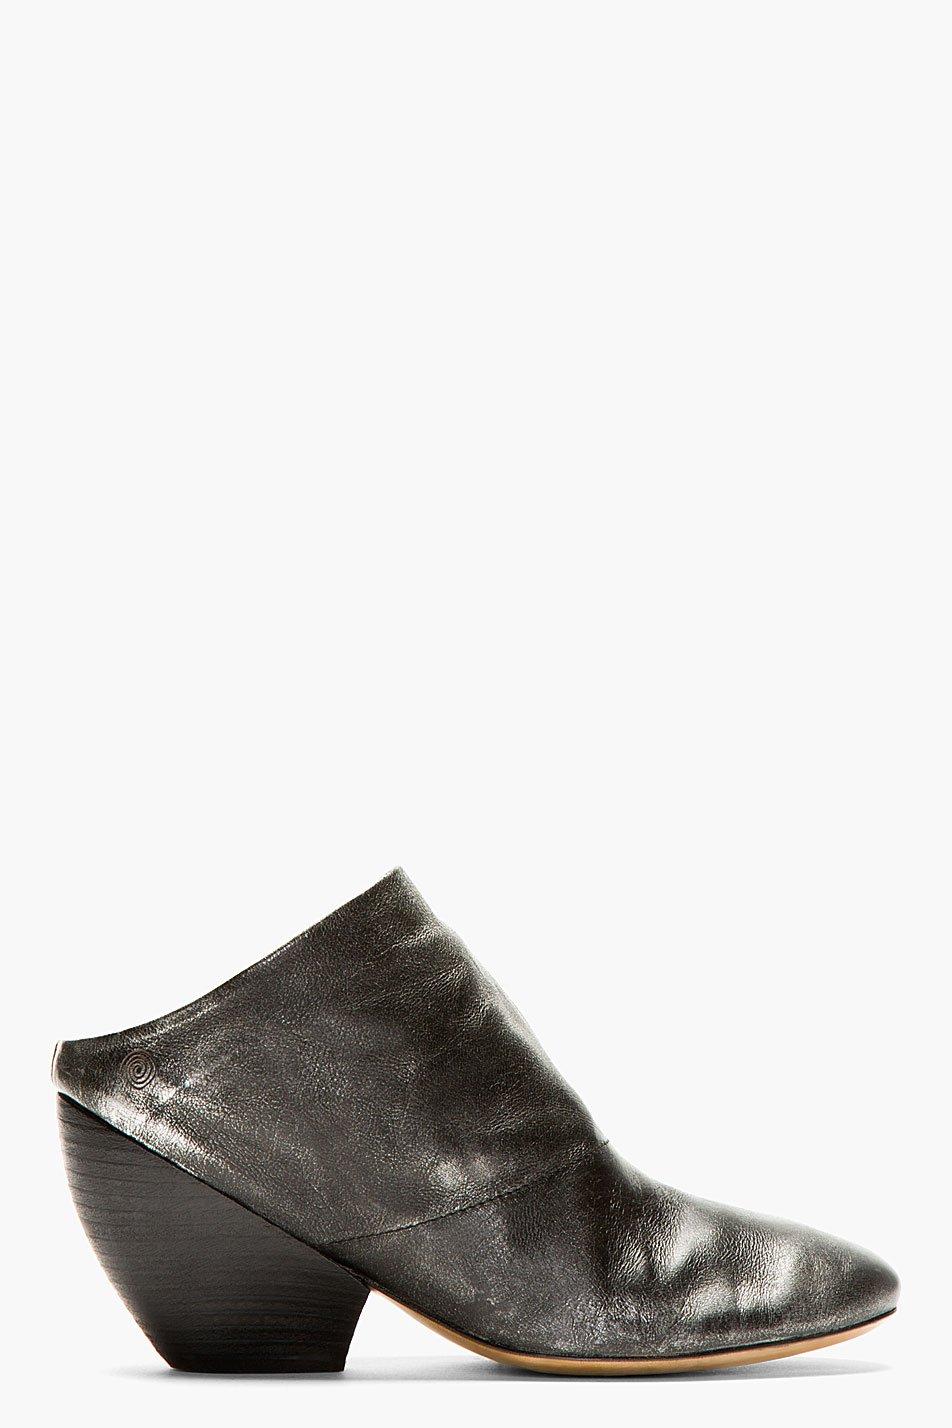 Marsll black metallic leather slouchy clogs